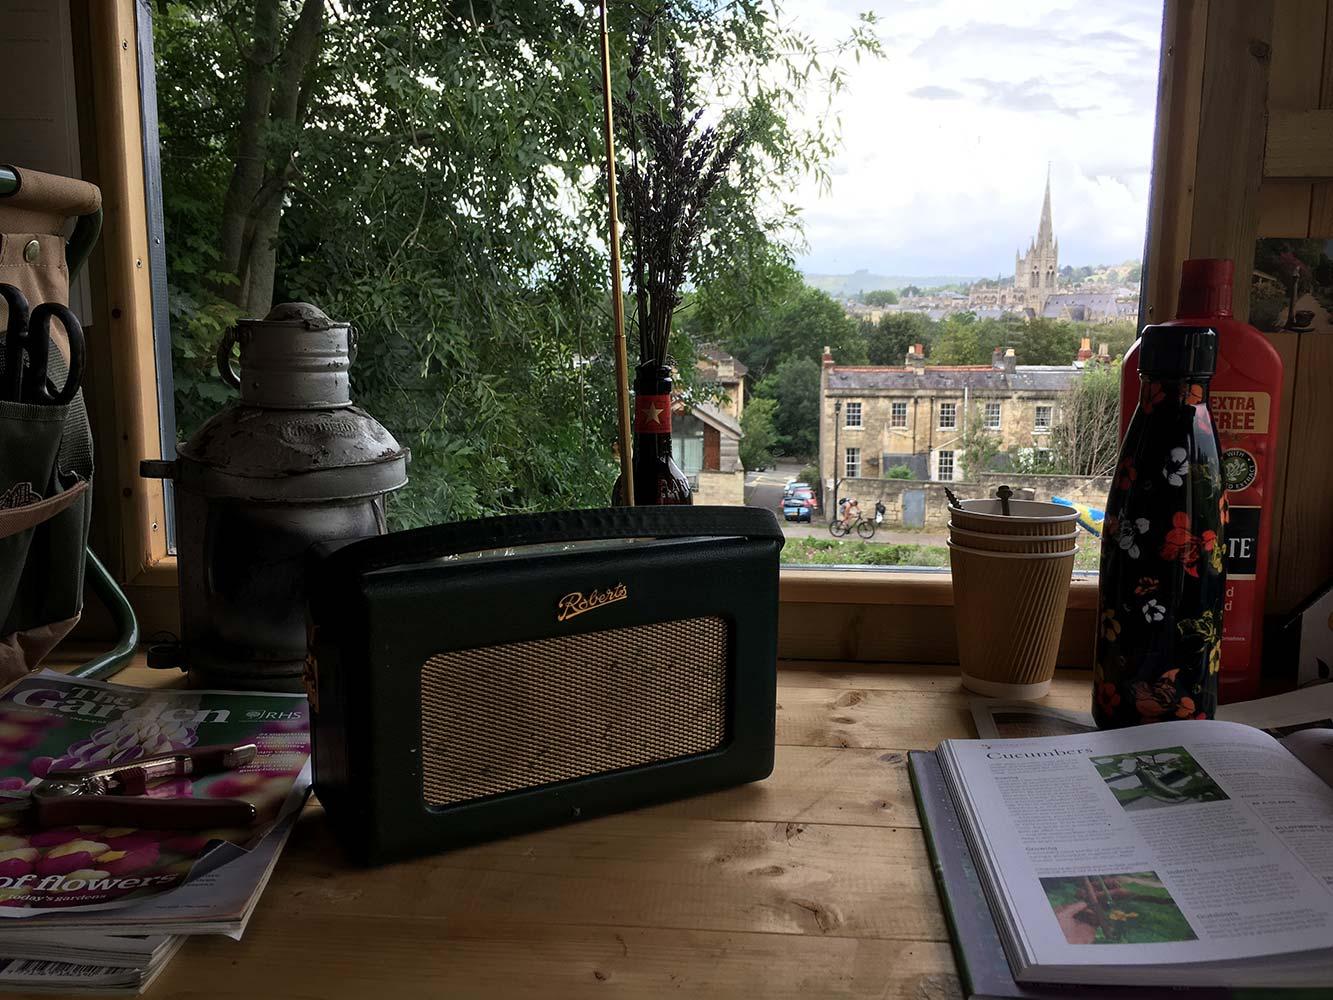 Garden-Affairs-allotment-shed-interior